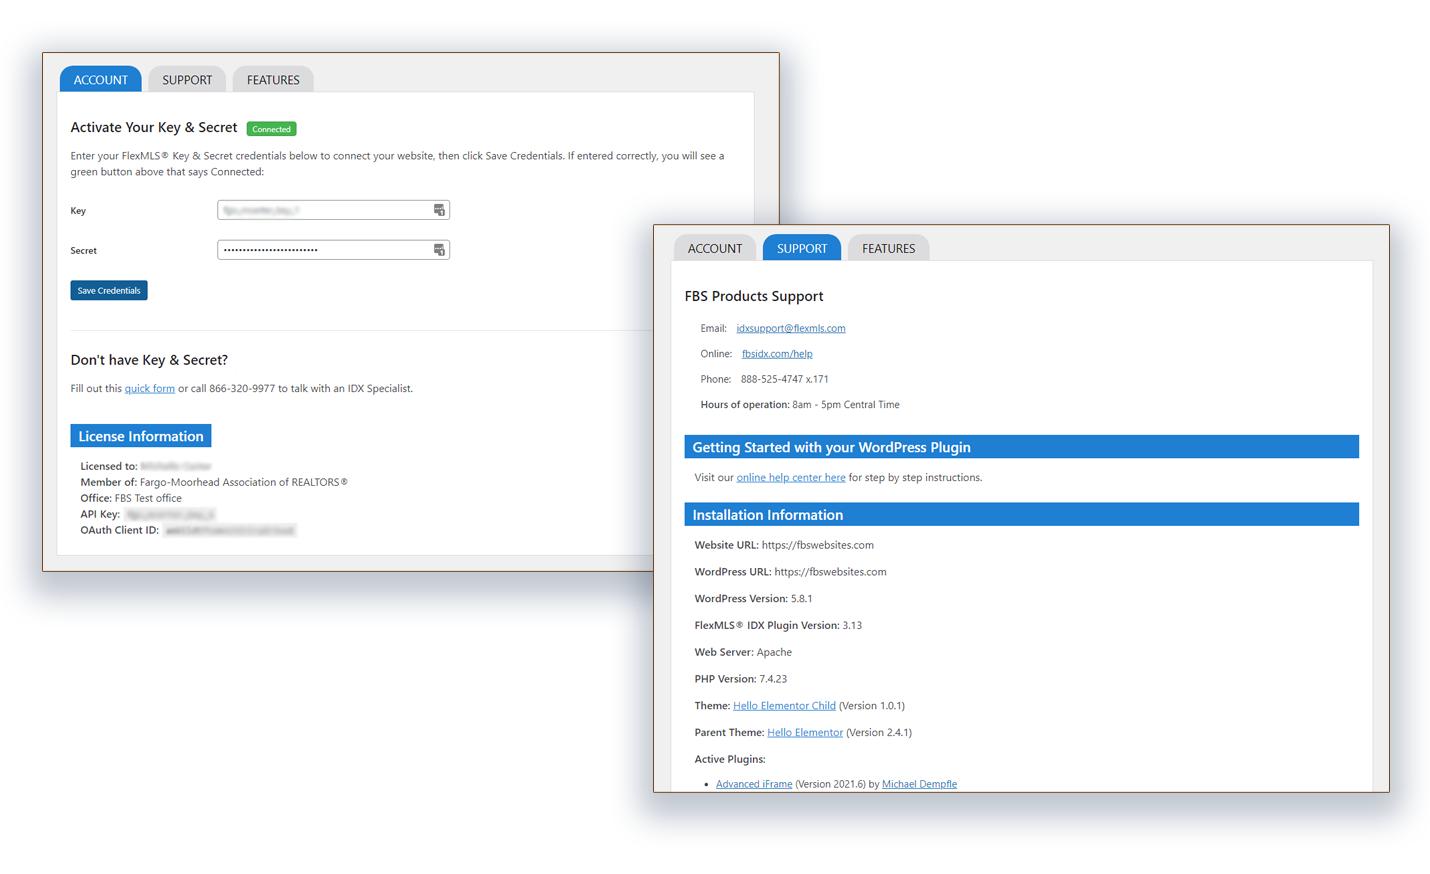 Flexmls IDX WordPress Plugin Update v3.13 Redesigned Setup and Support areas